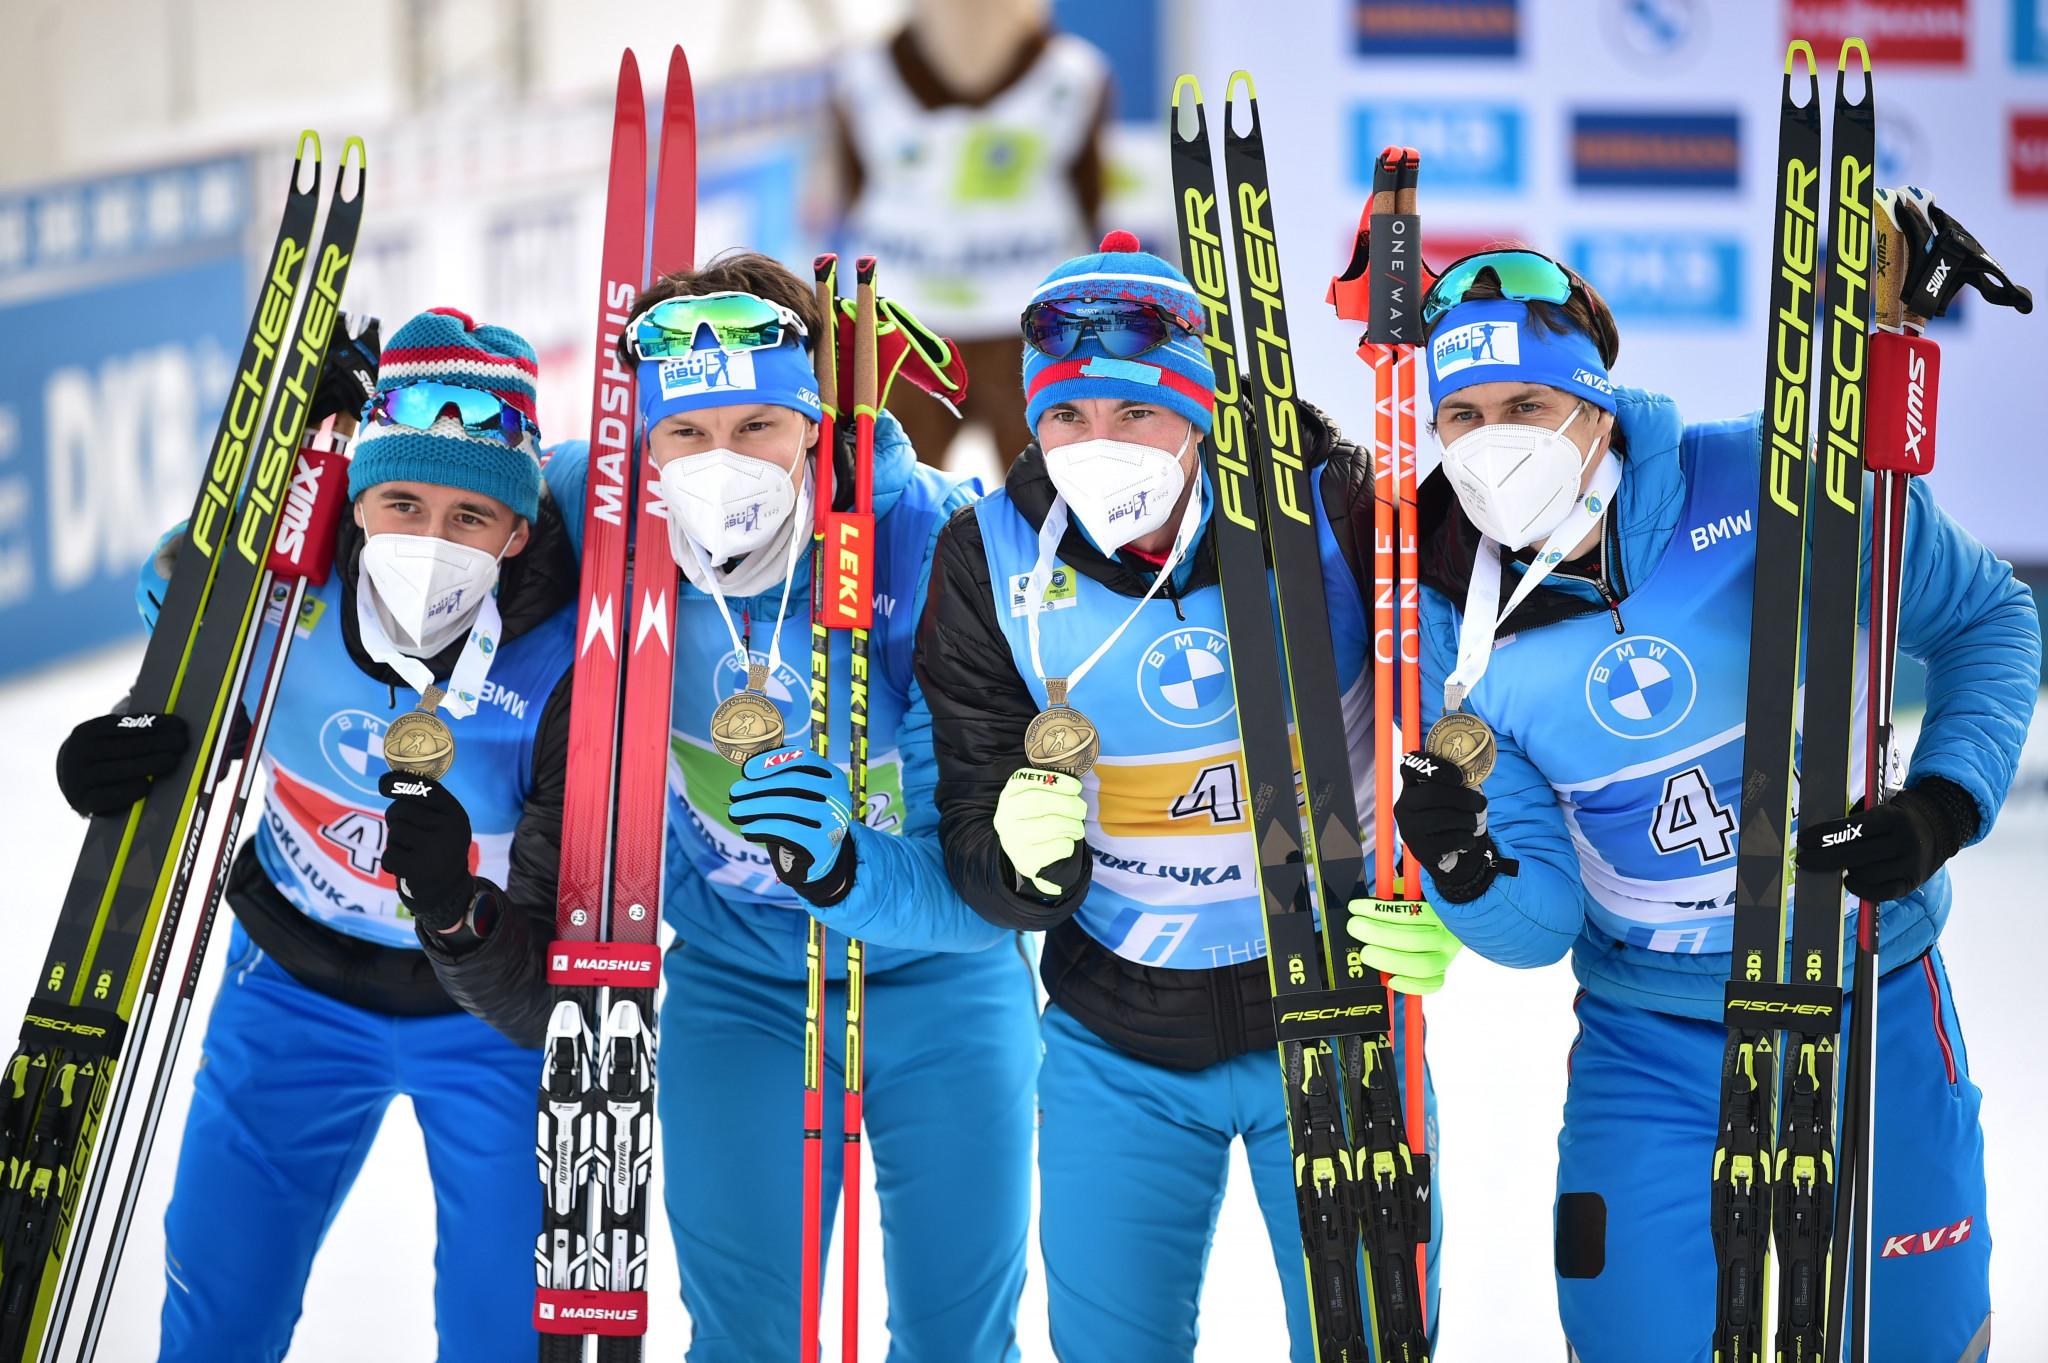 The RBU won one medal - men's relay bronze - at the 2021 Biathlon World Championships in Pokljuka in Slovenia ©Getty Images